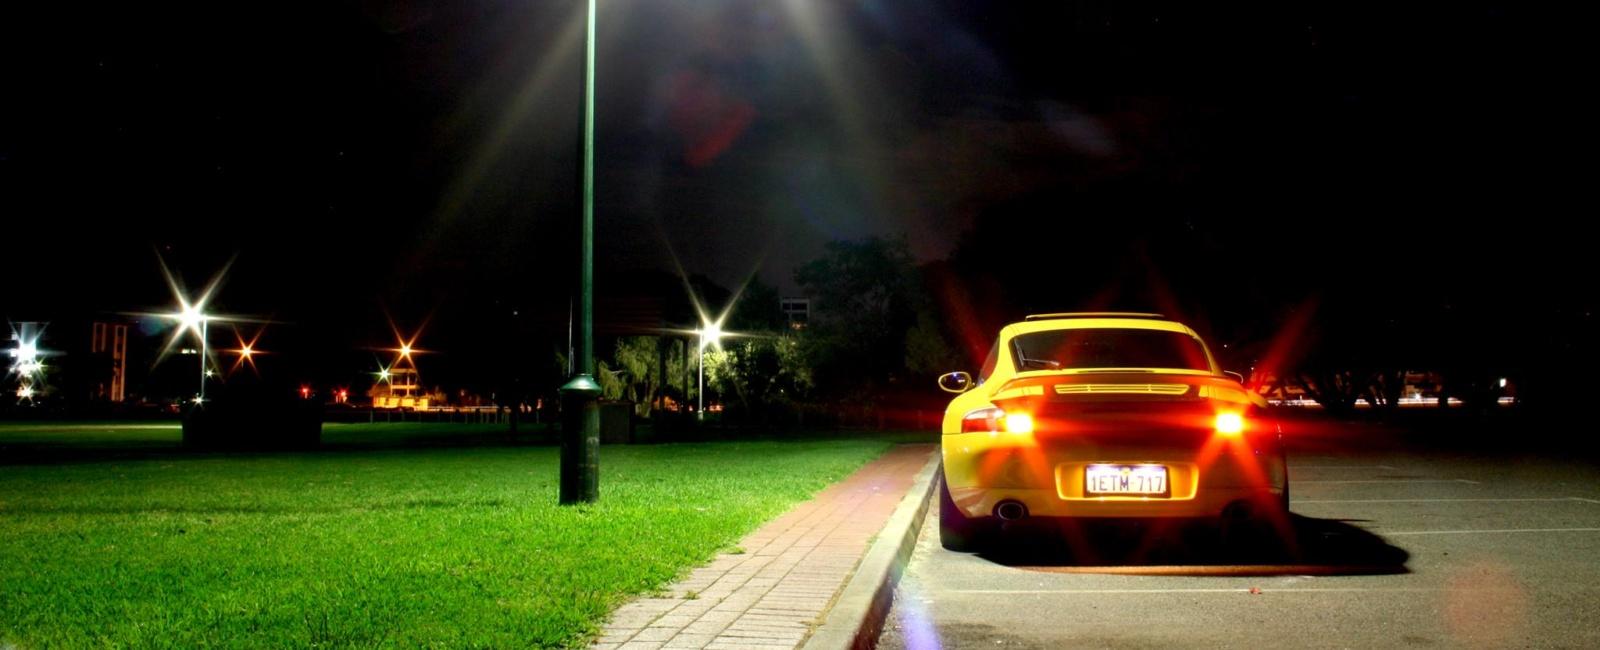 HD Supercars